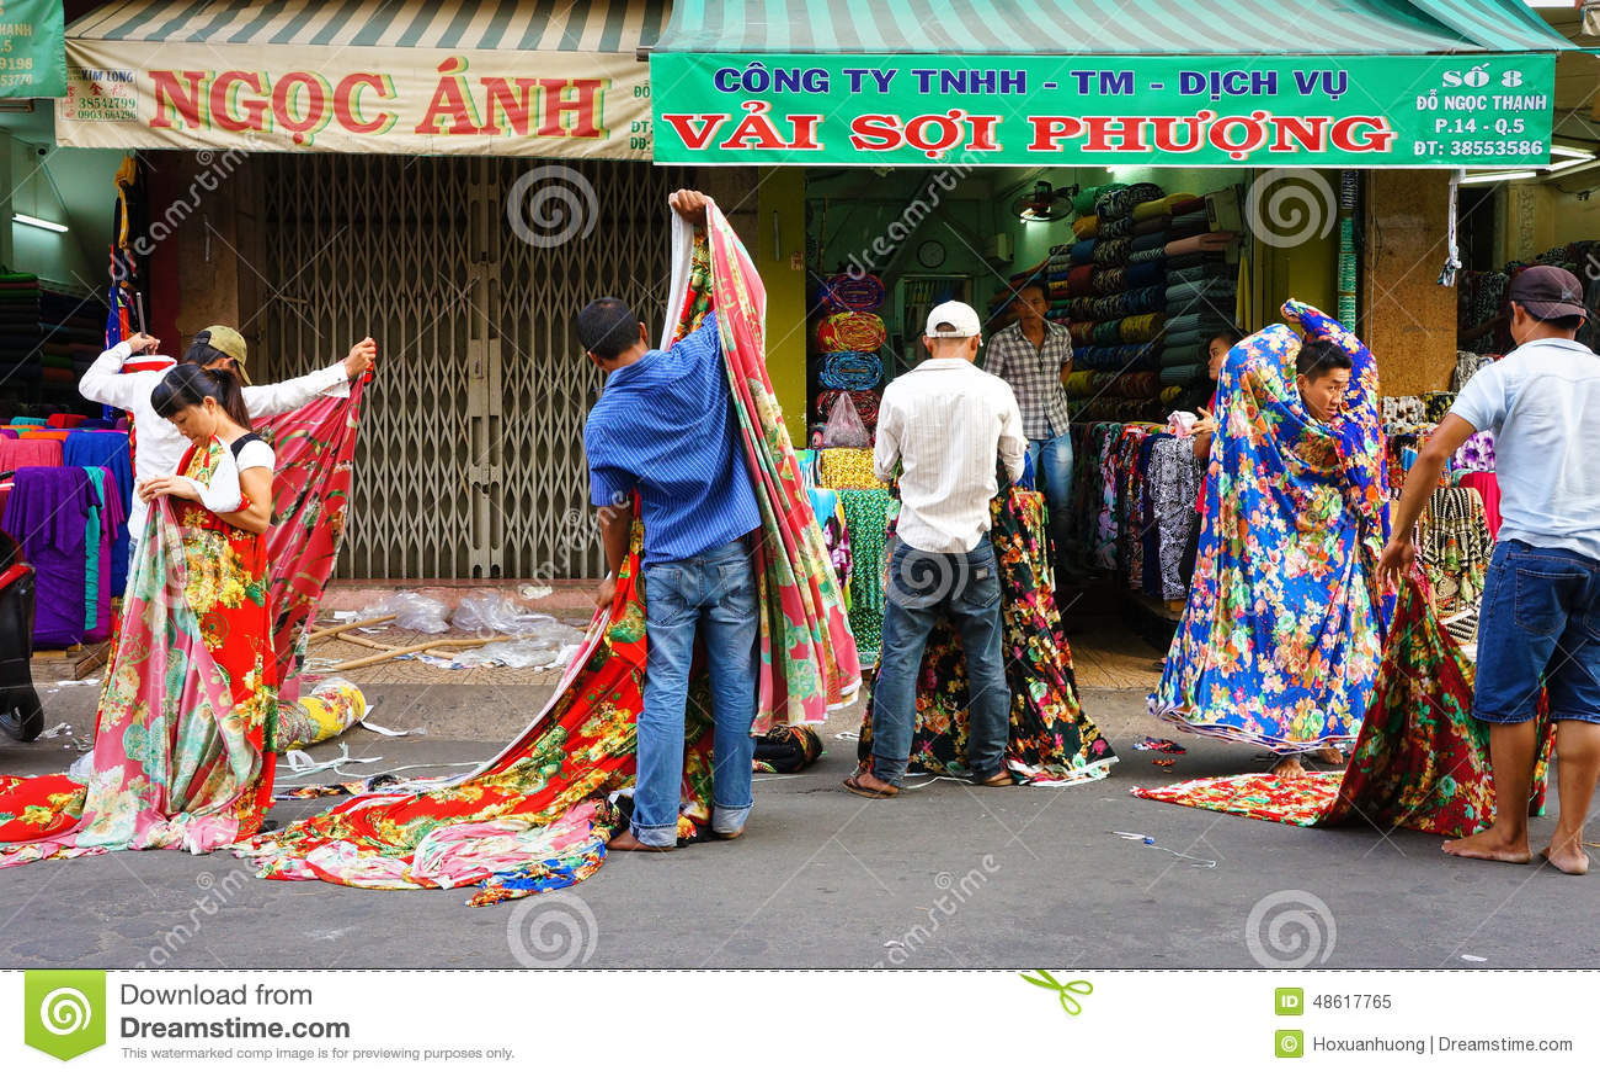 Vietnamese clothing store